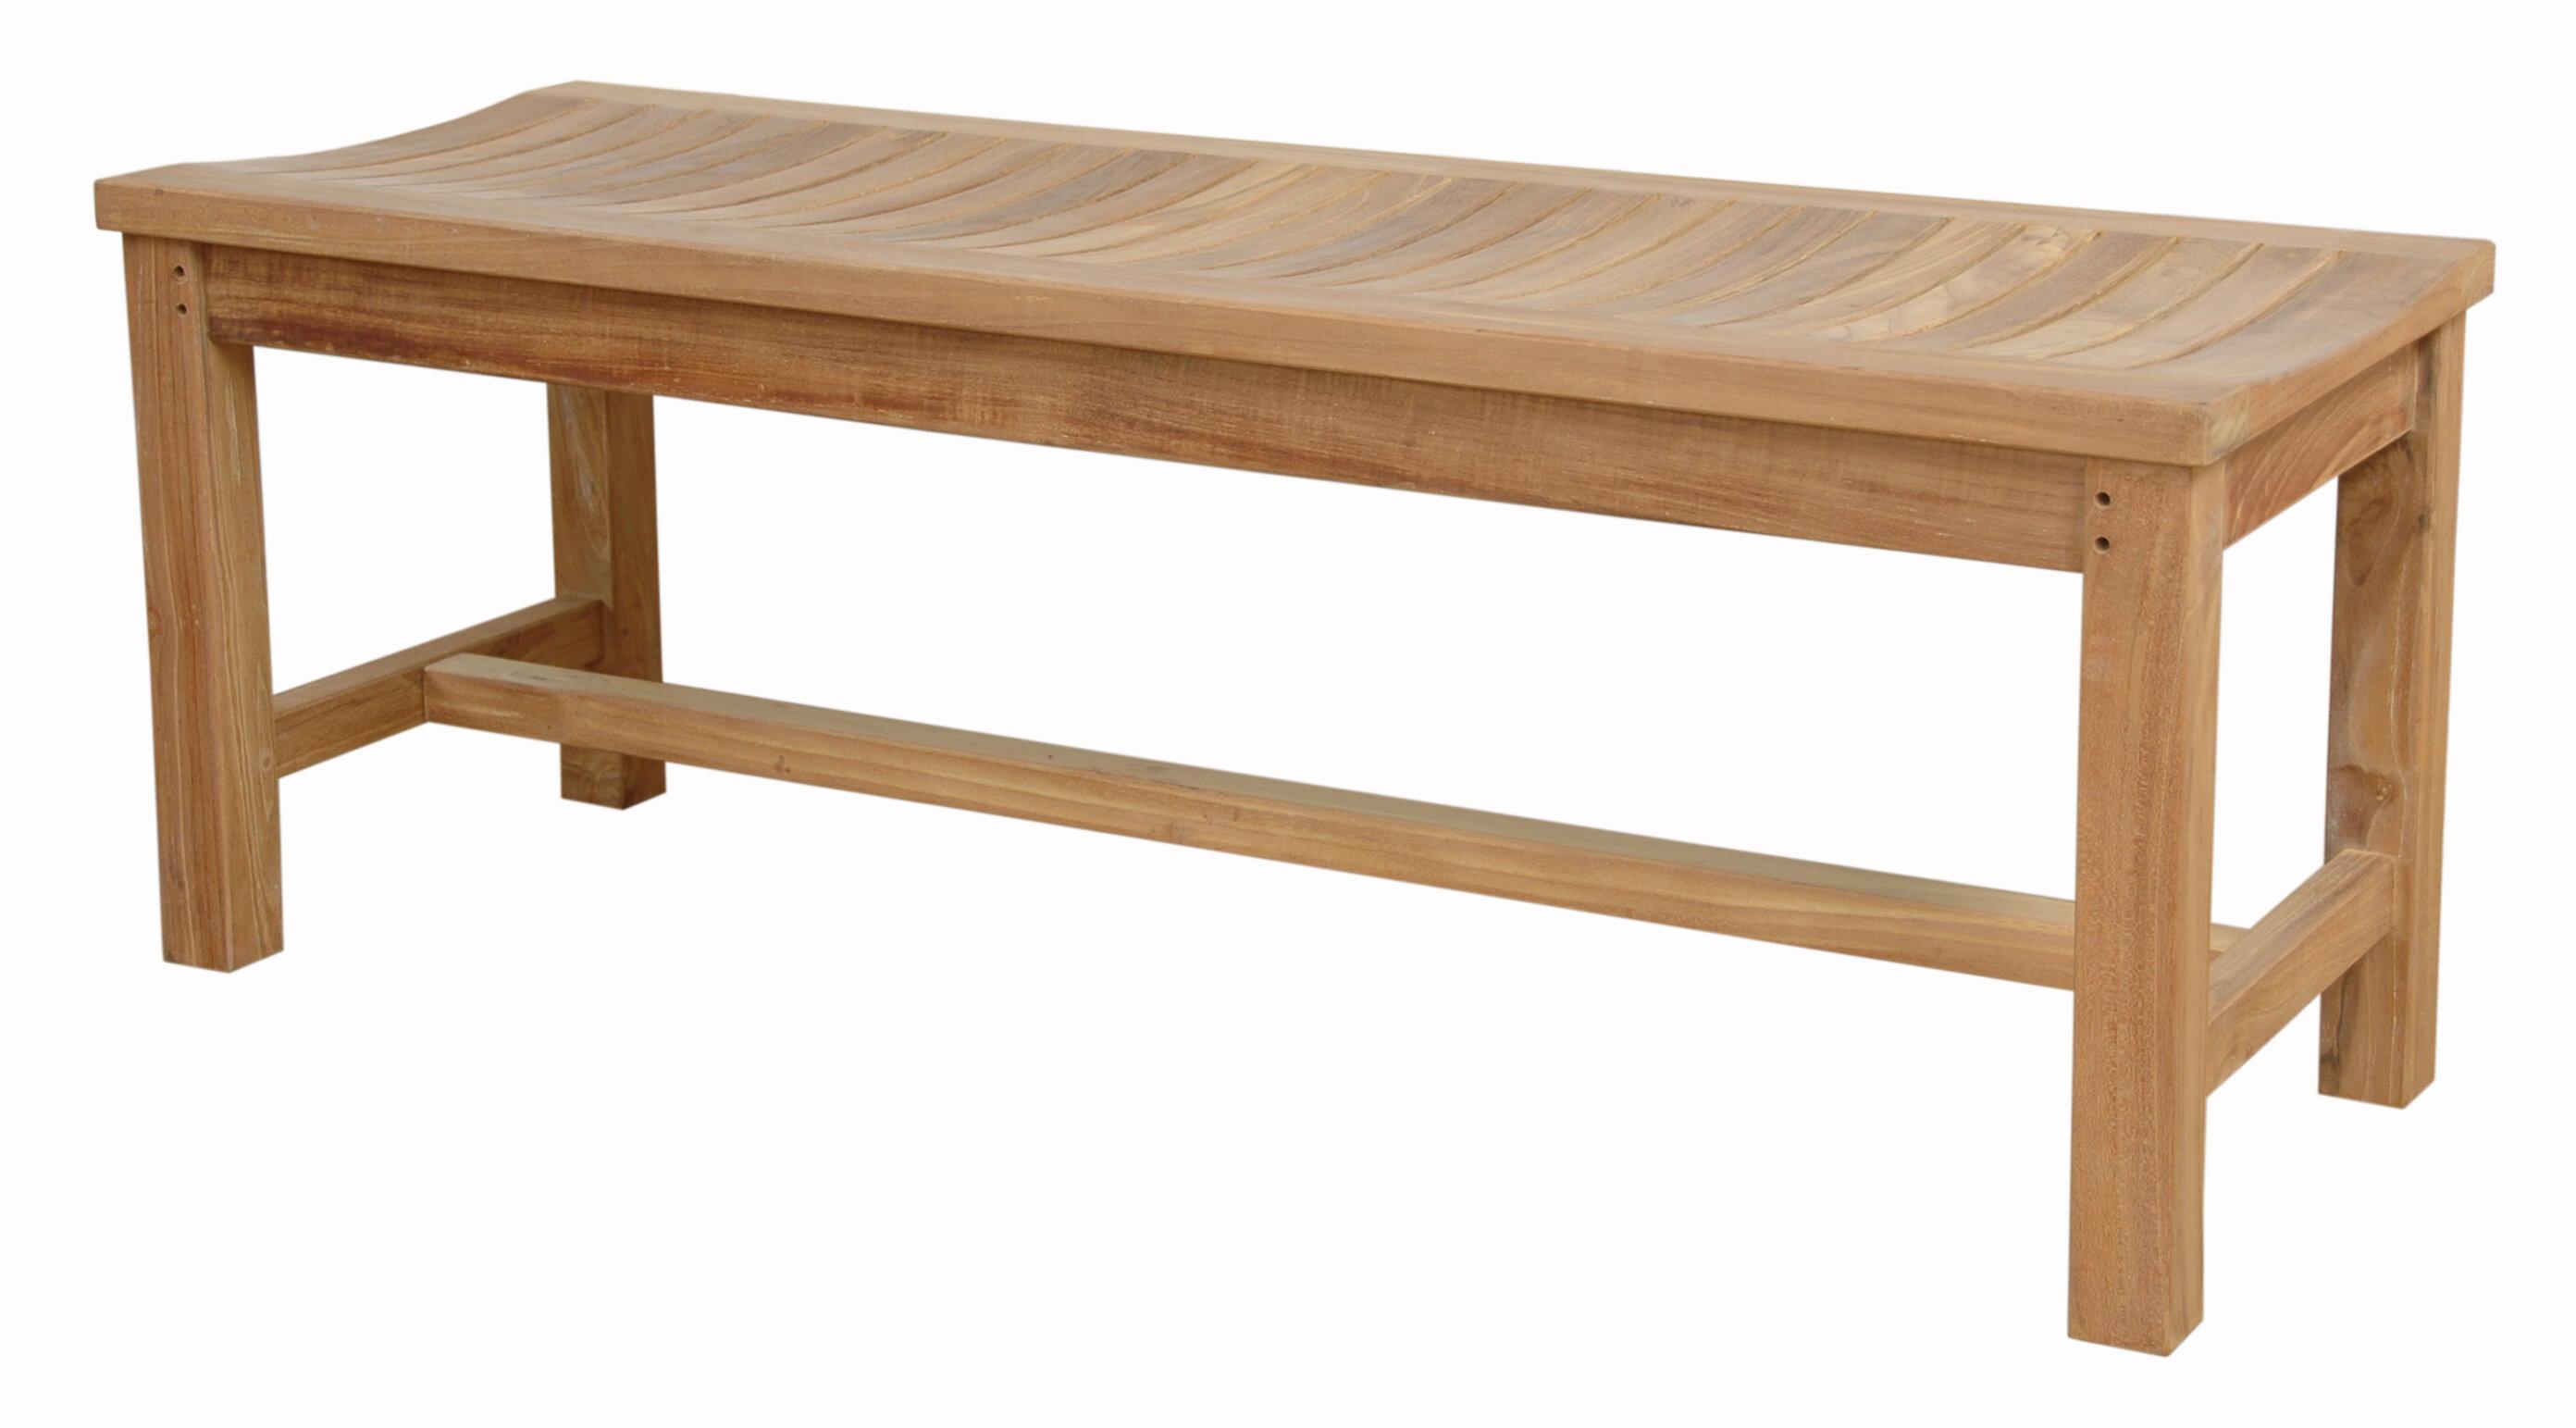 Marvelous Madison Backless Teak Picnic Bench Lamtechconsult Wood Chair Design Ideas Lamtechconsultcom